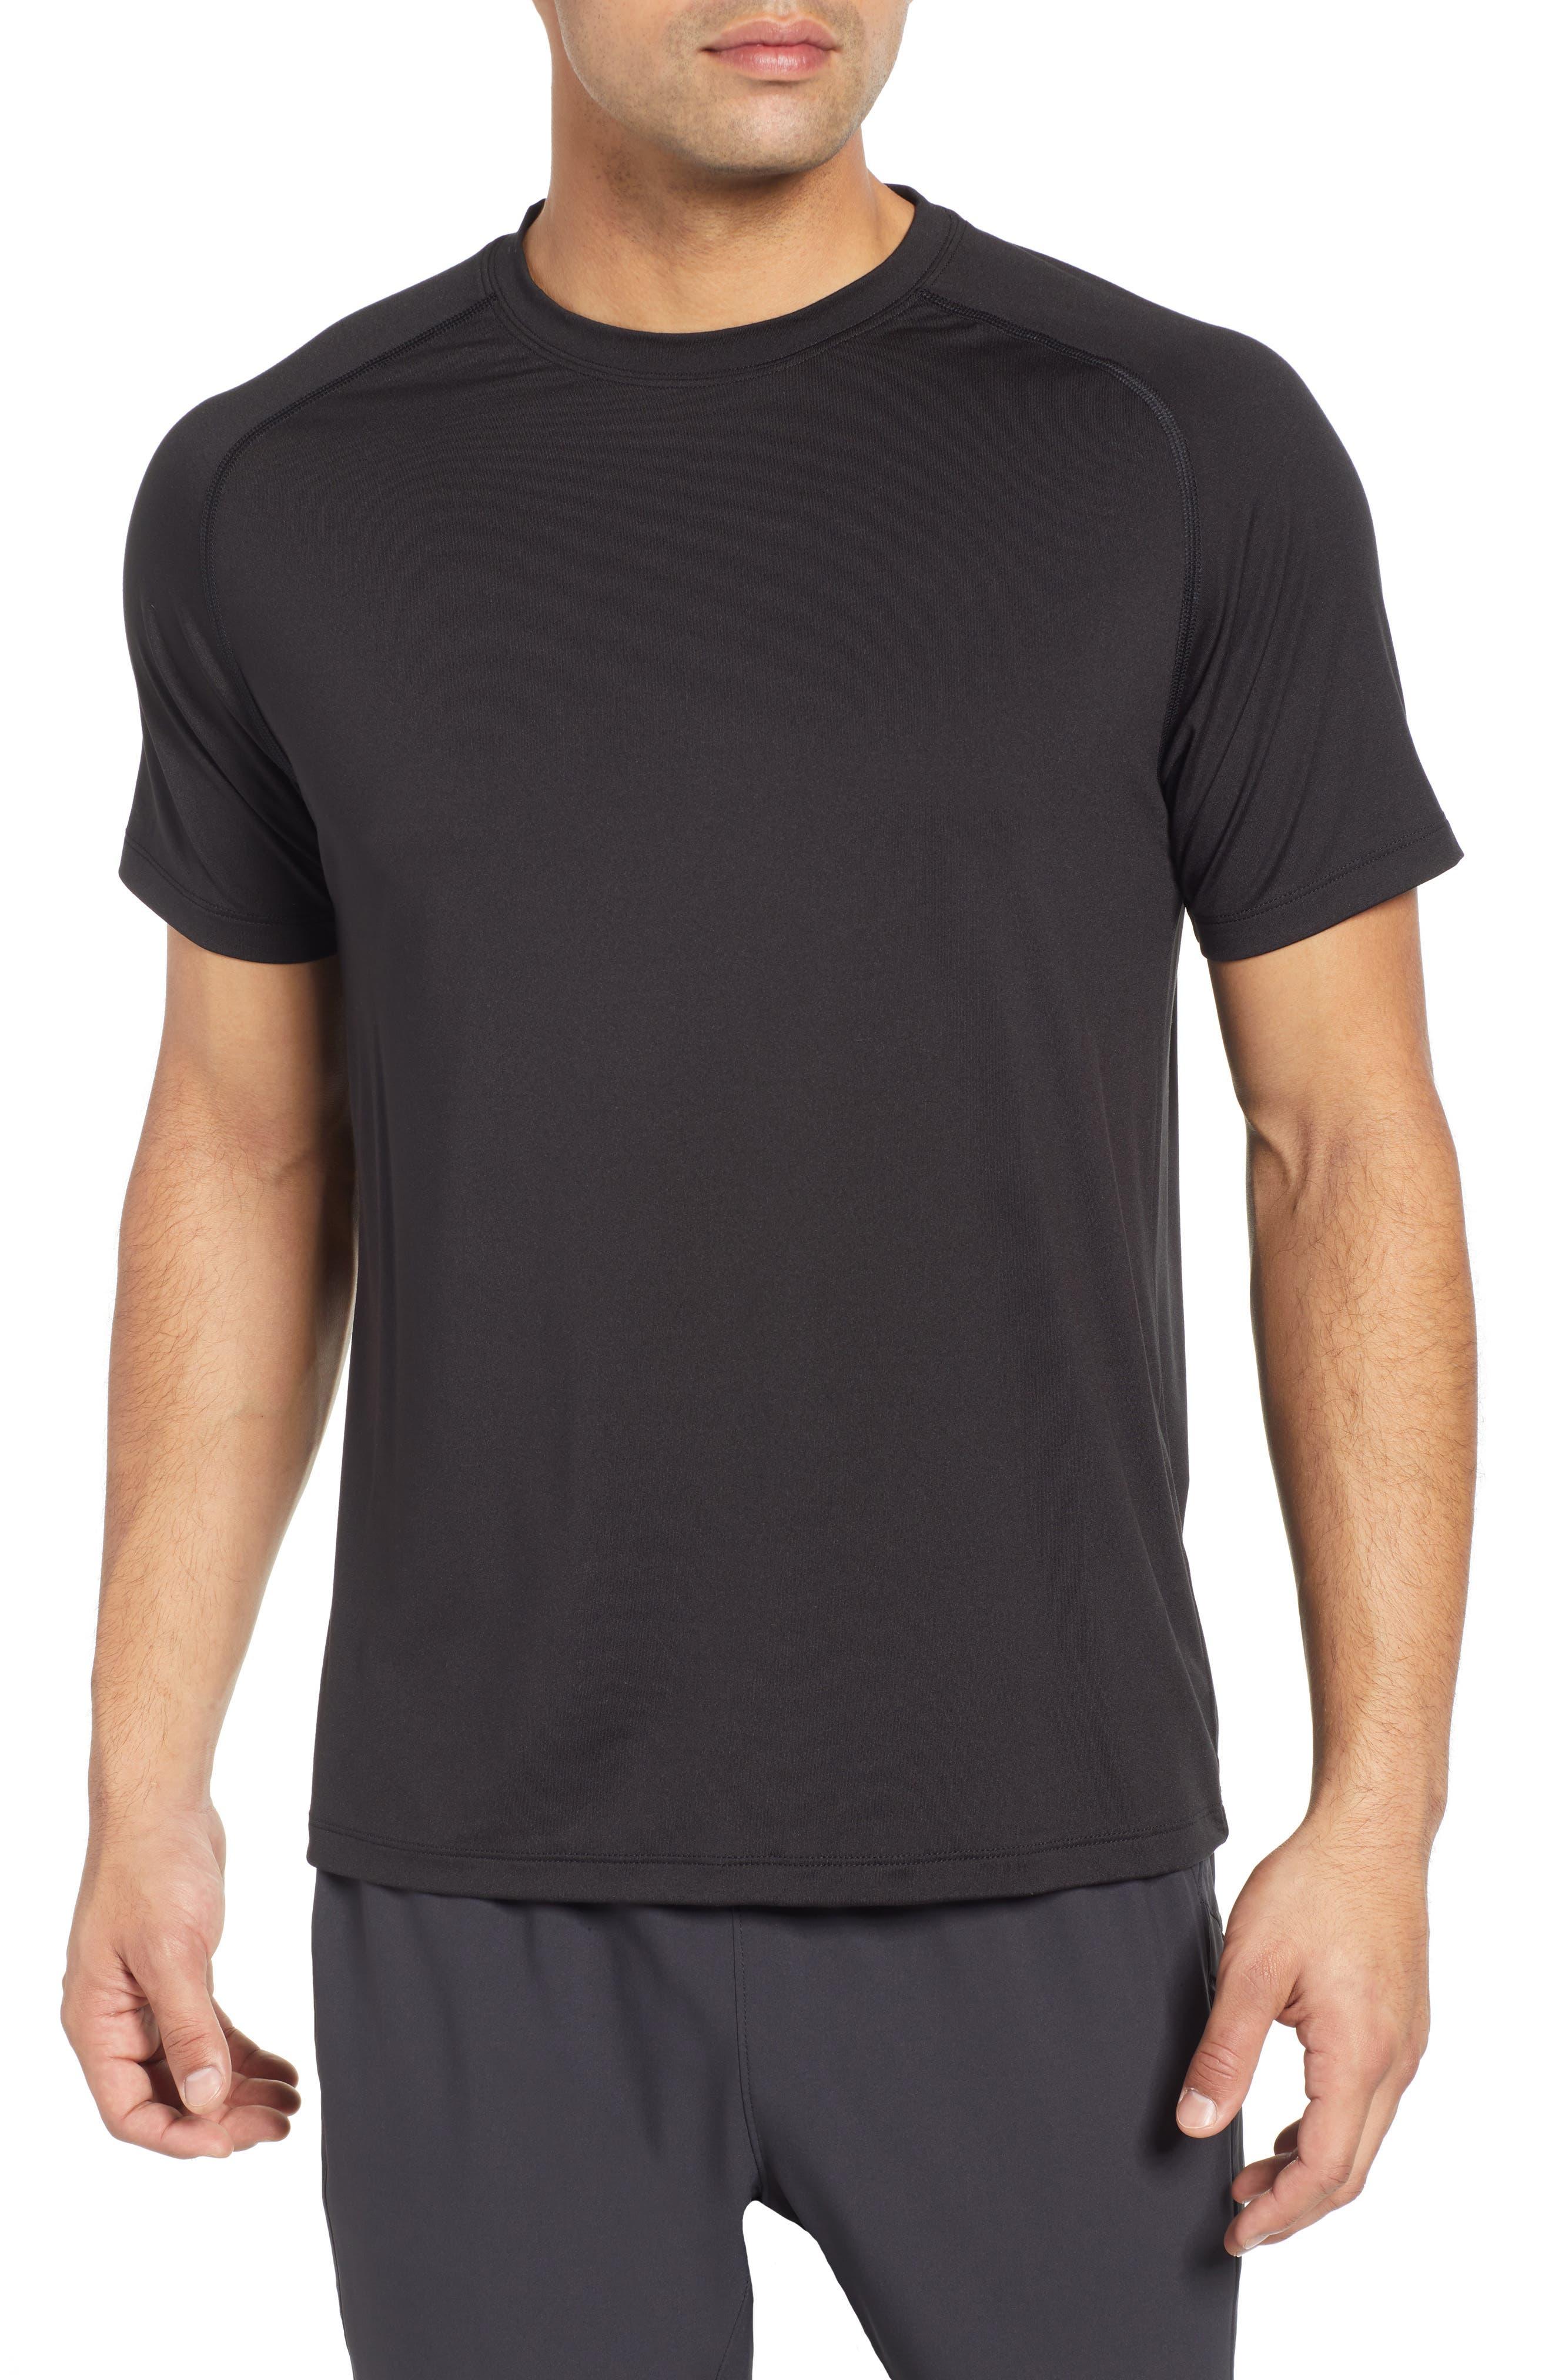 Rio Regular Fit Technical T-Shirt,                         Main,                         color, BLACK